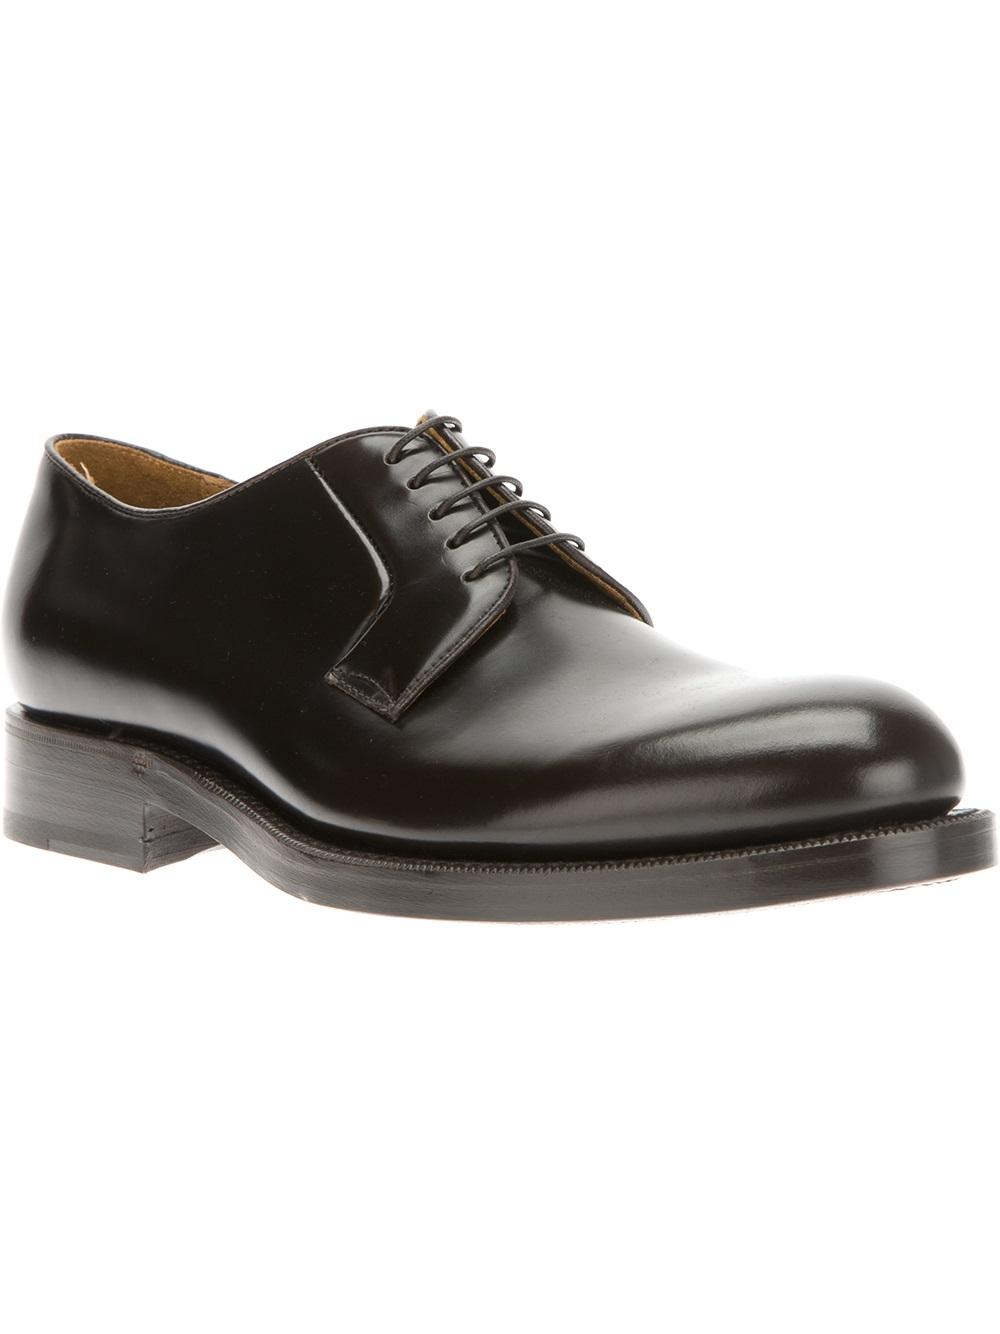 Simons Shoe Store